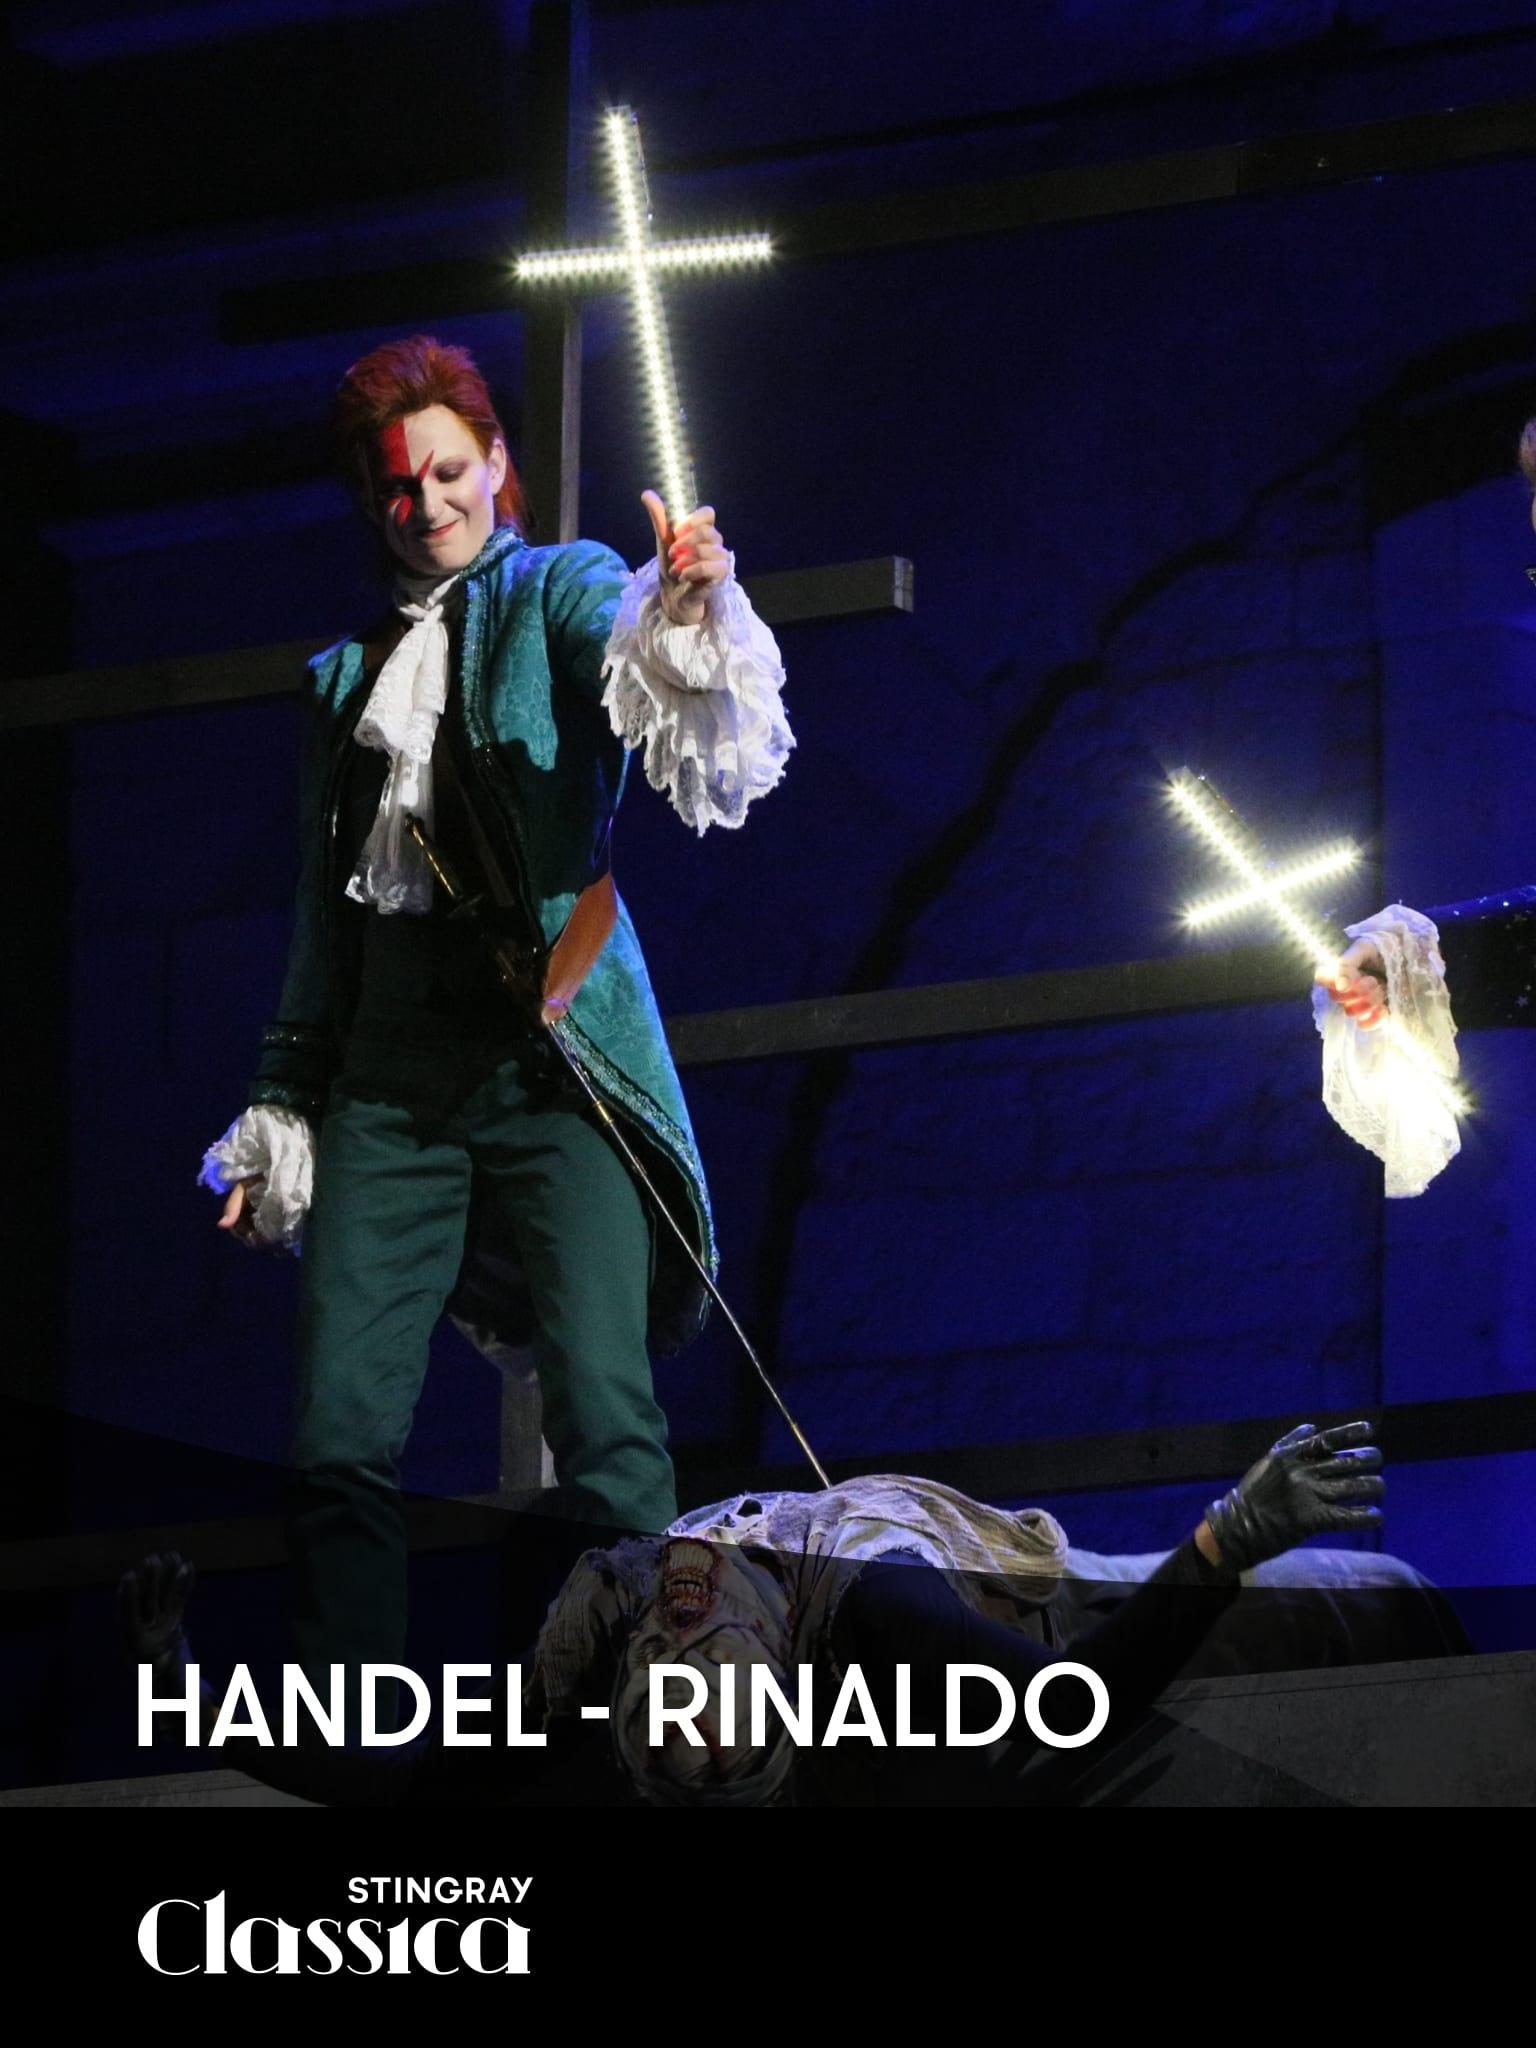 Händel - Rinaldo